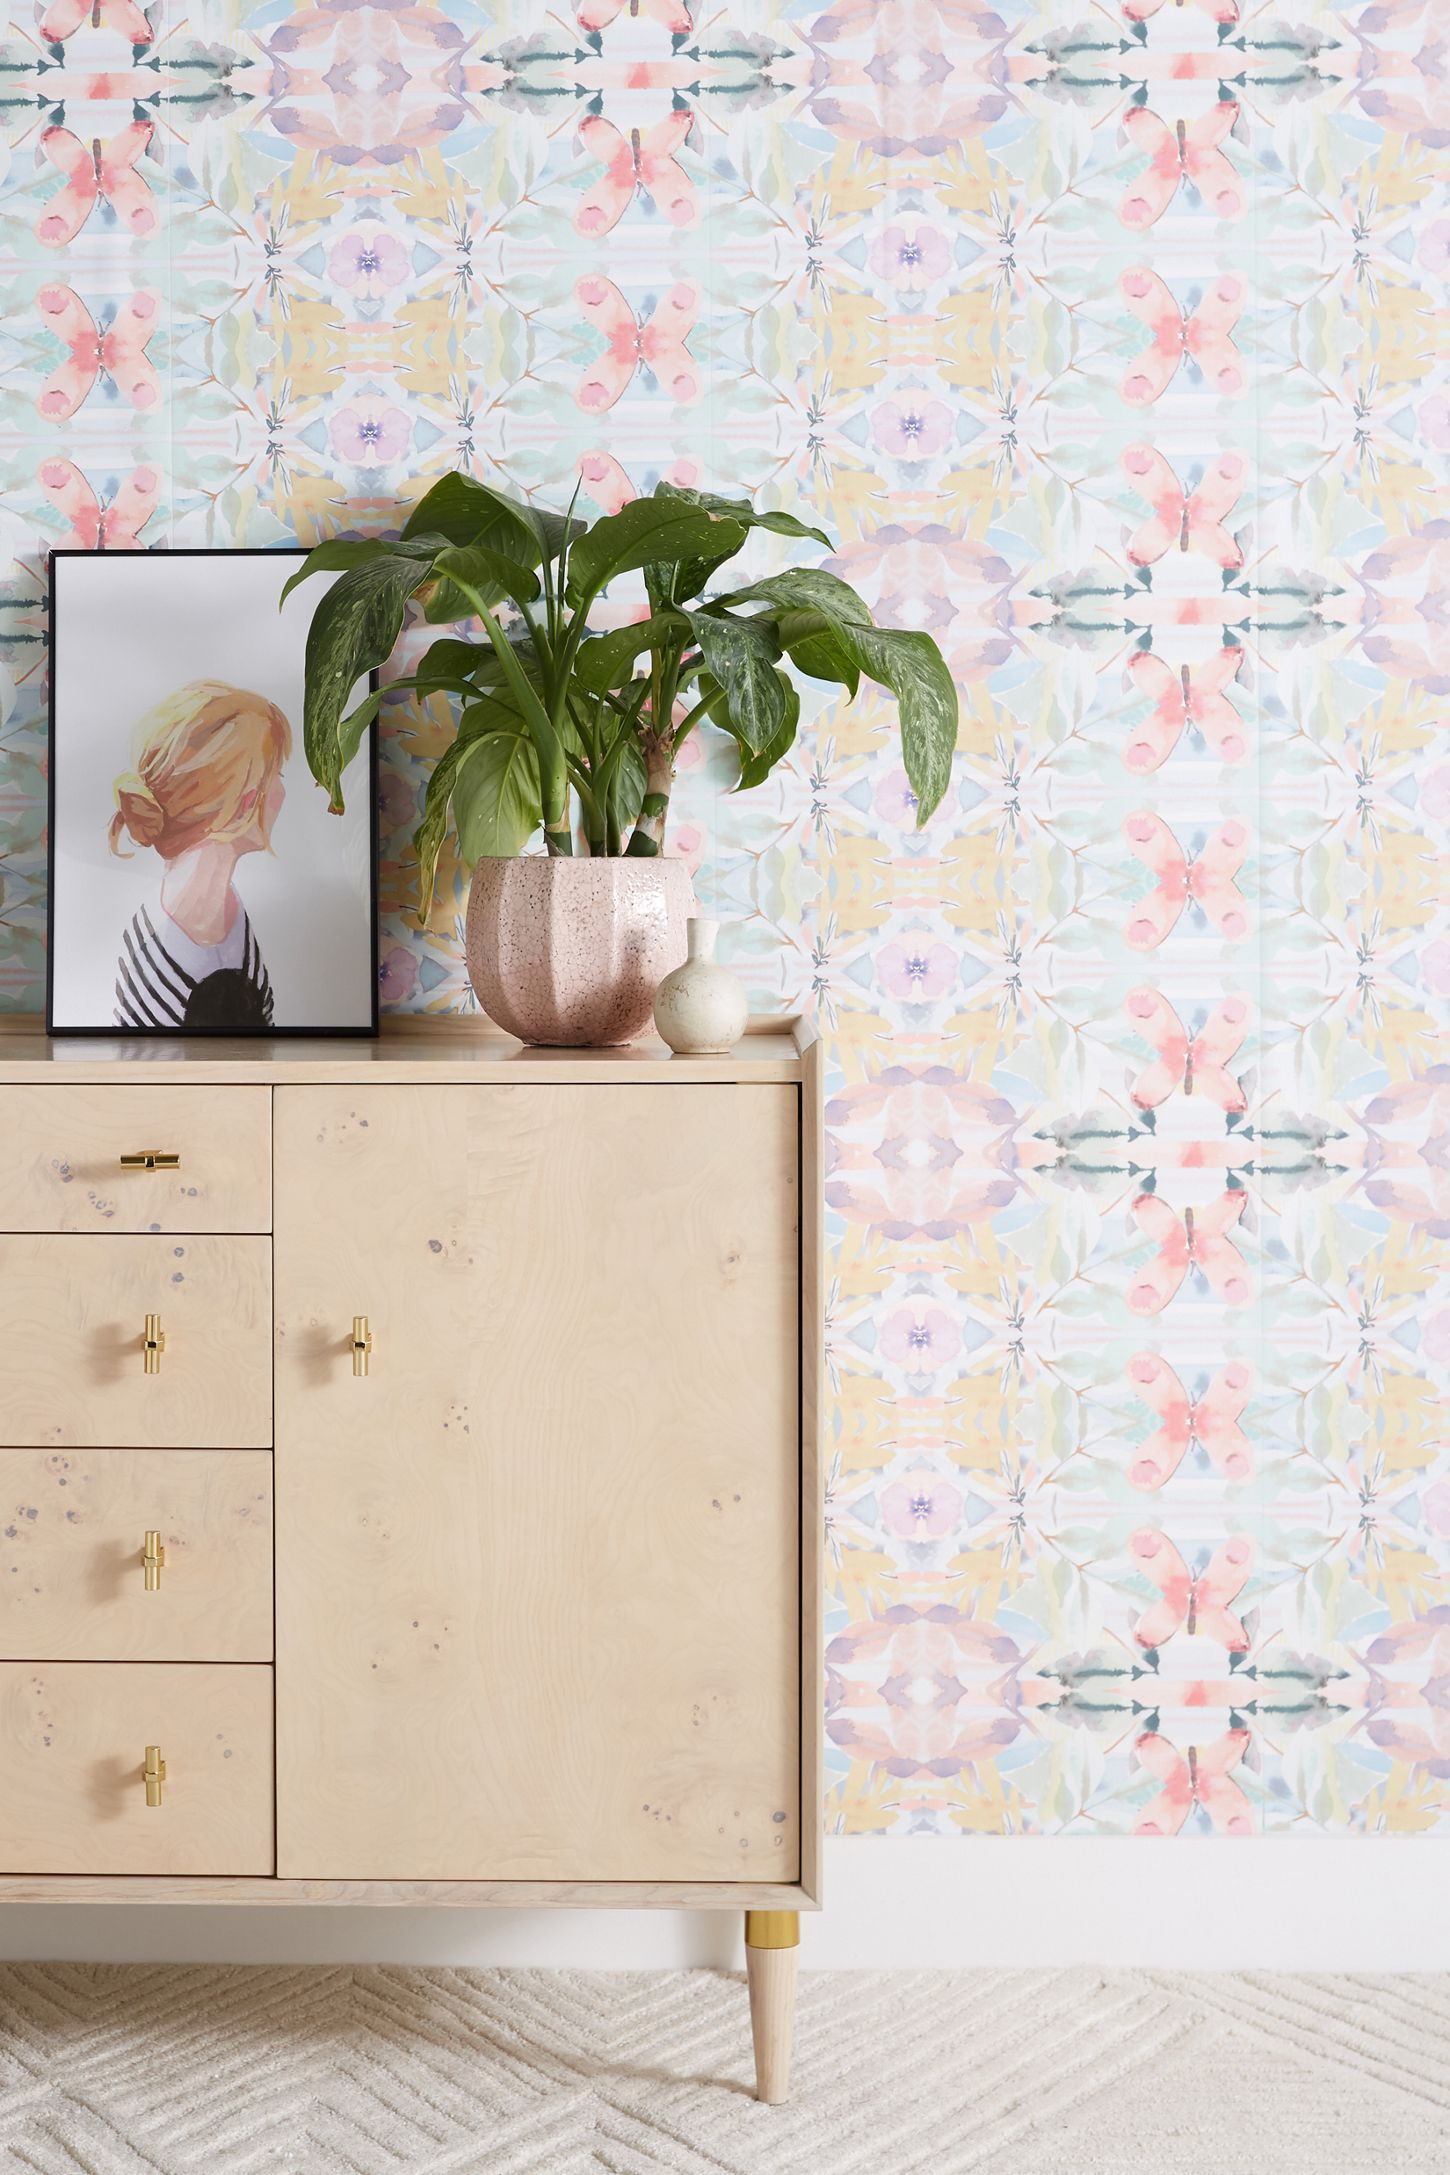 Slide View 1 Synchronized Wallpaper Wall Coverings Decor Buy Wallpaper Online